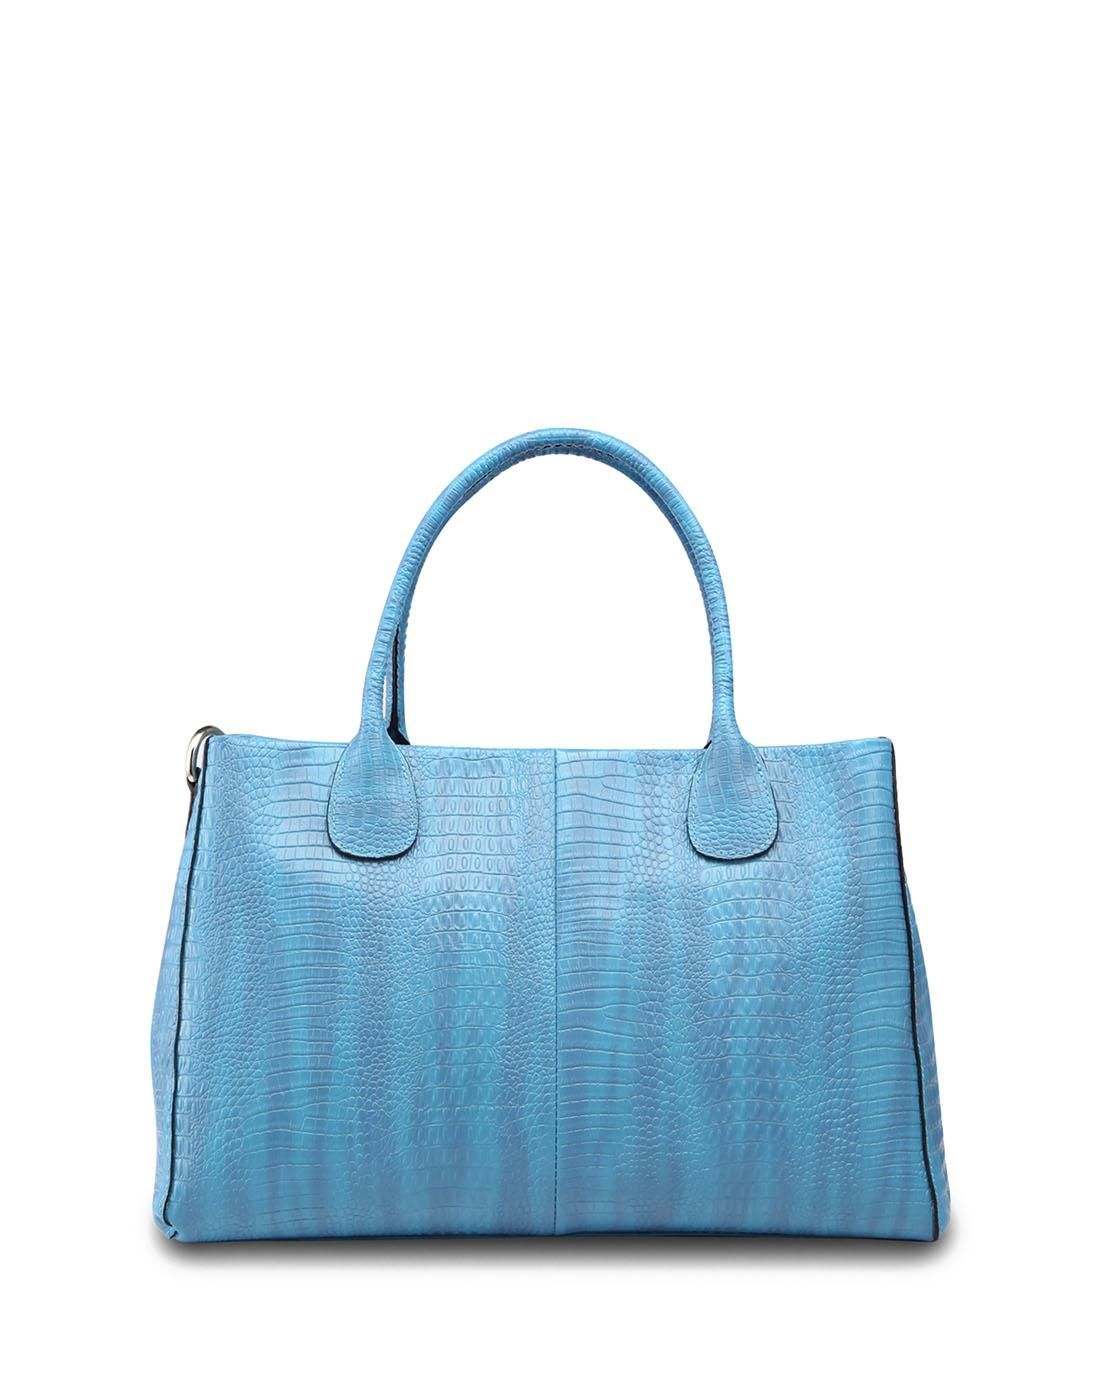 eaa4f5fe0d0a  AdoreWe  VIPme Totes - Meidu Blue Leather Crocodile Classic Tote - AdoreWe .com